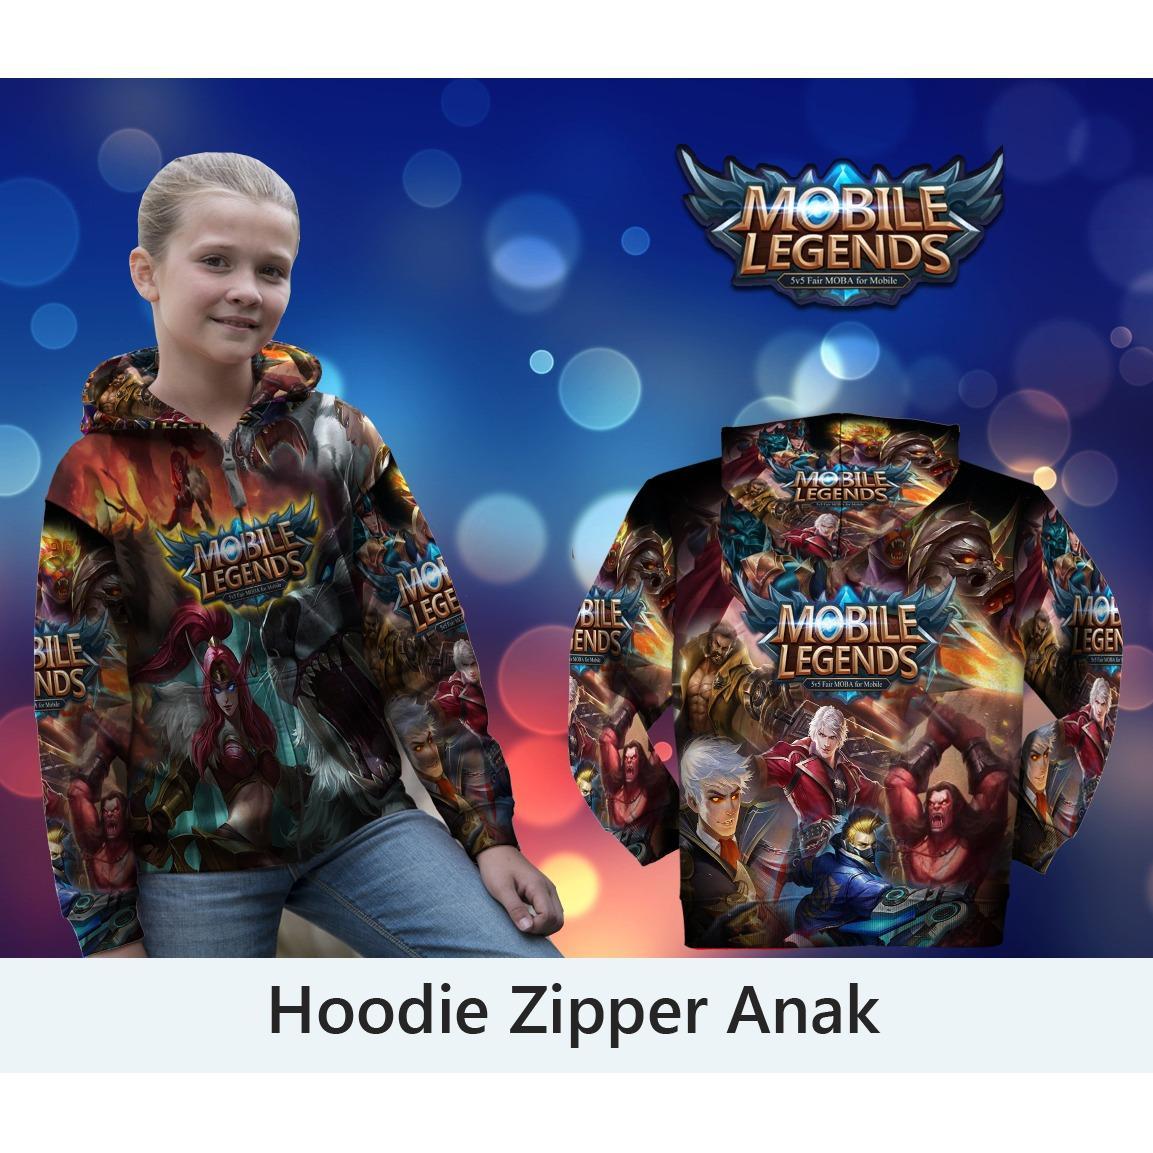 Jaket Hoodie Anak Zipper Fullprint Custom Mobile Legend All Skin IRITHEL